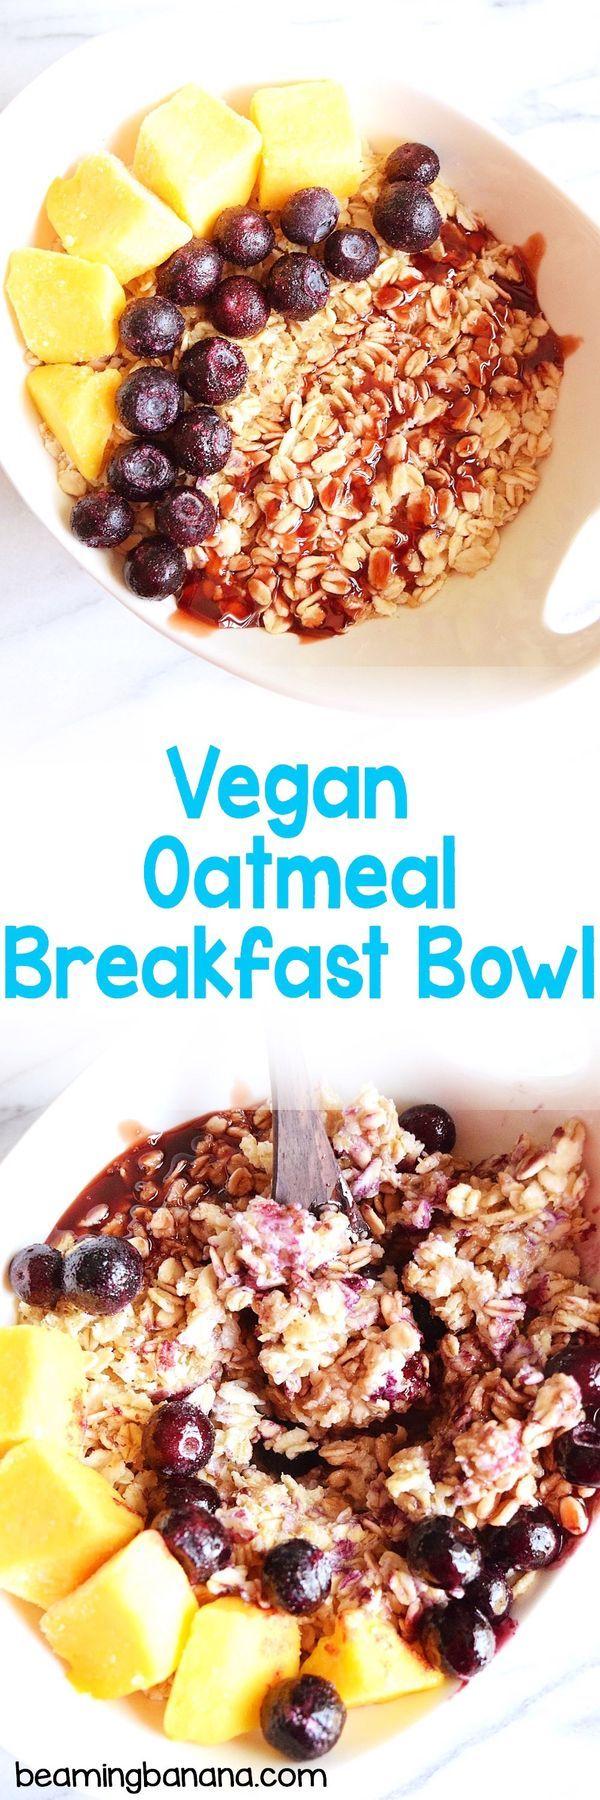 Vegan Oatmeal Breakfast Bowl Recipe With Images Vegan Oatmeal Oatmeal Breakfast Breakfast Bowls